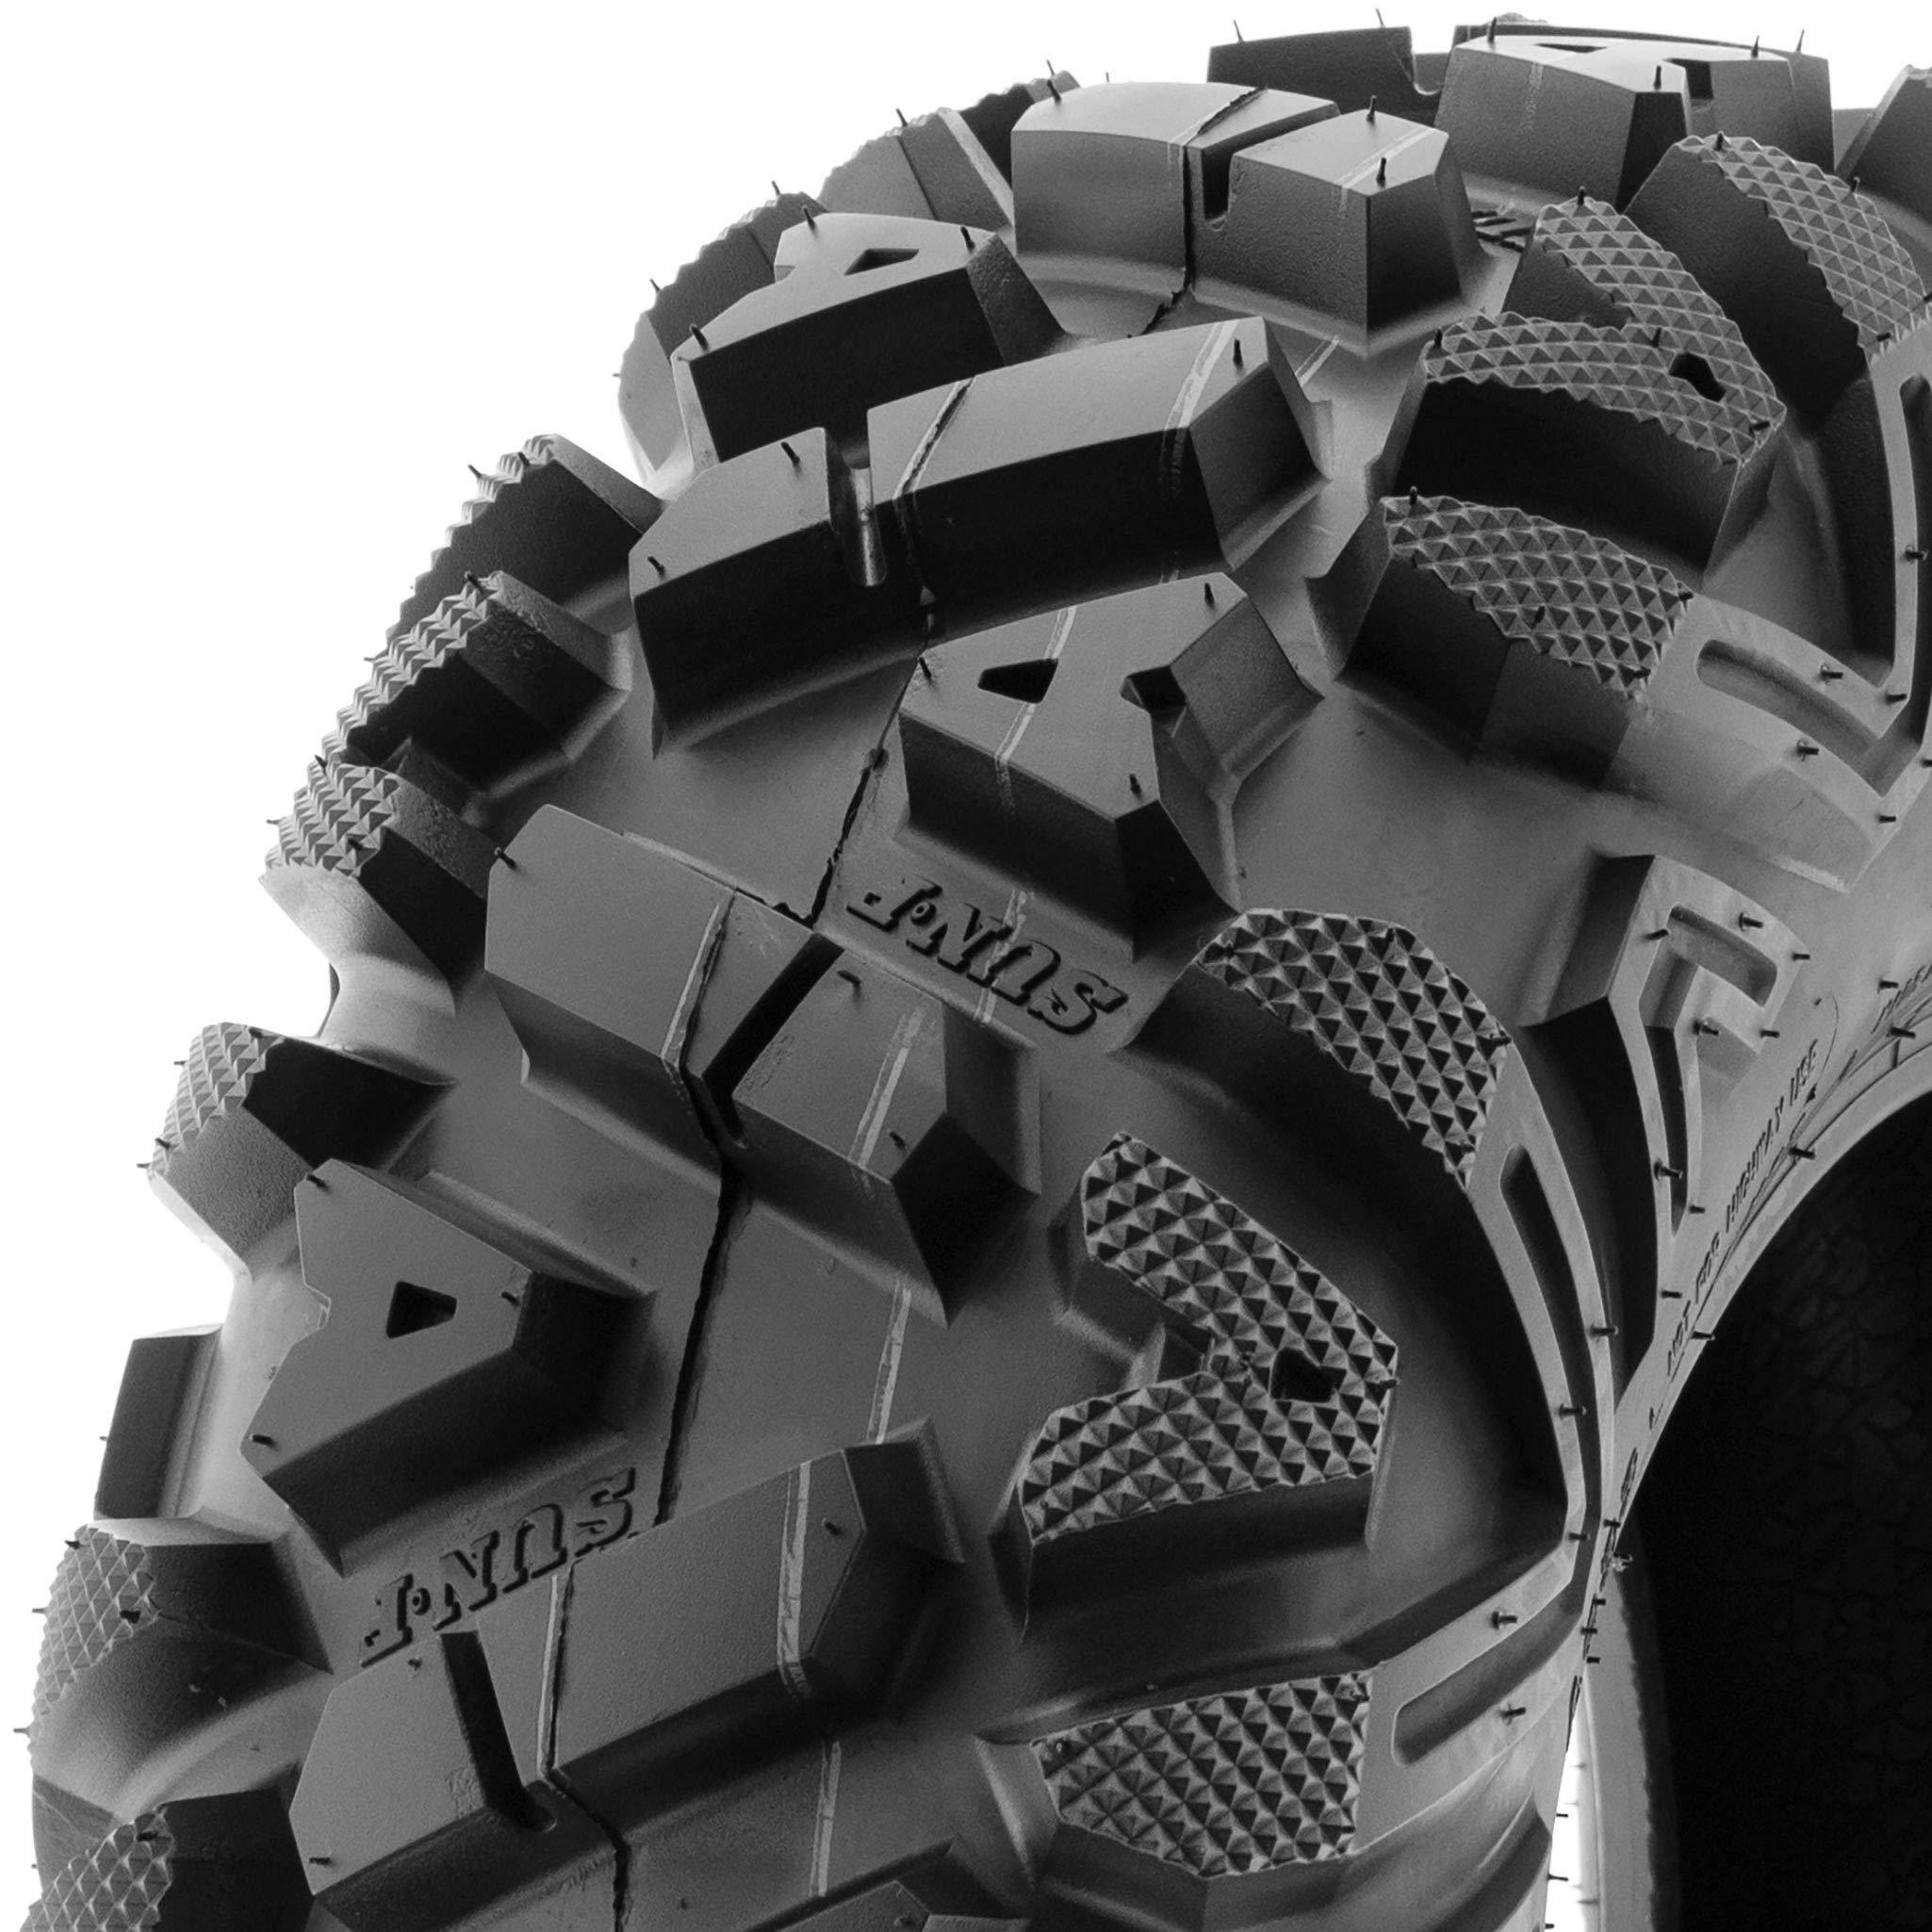 Set of 4 SunF Power.I ATV/UTV AT all-terrain Tires 24x8-11 Front & 24x11-10 Rear, 6 PR, Tubeless A033 by SUNF (Image #7)